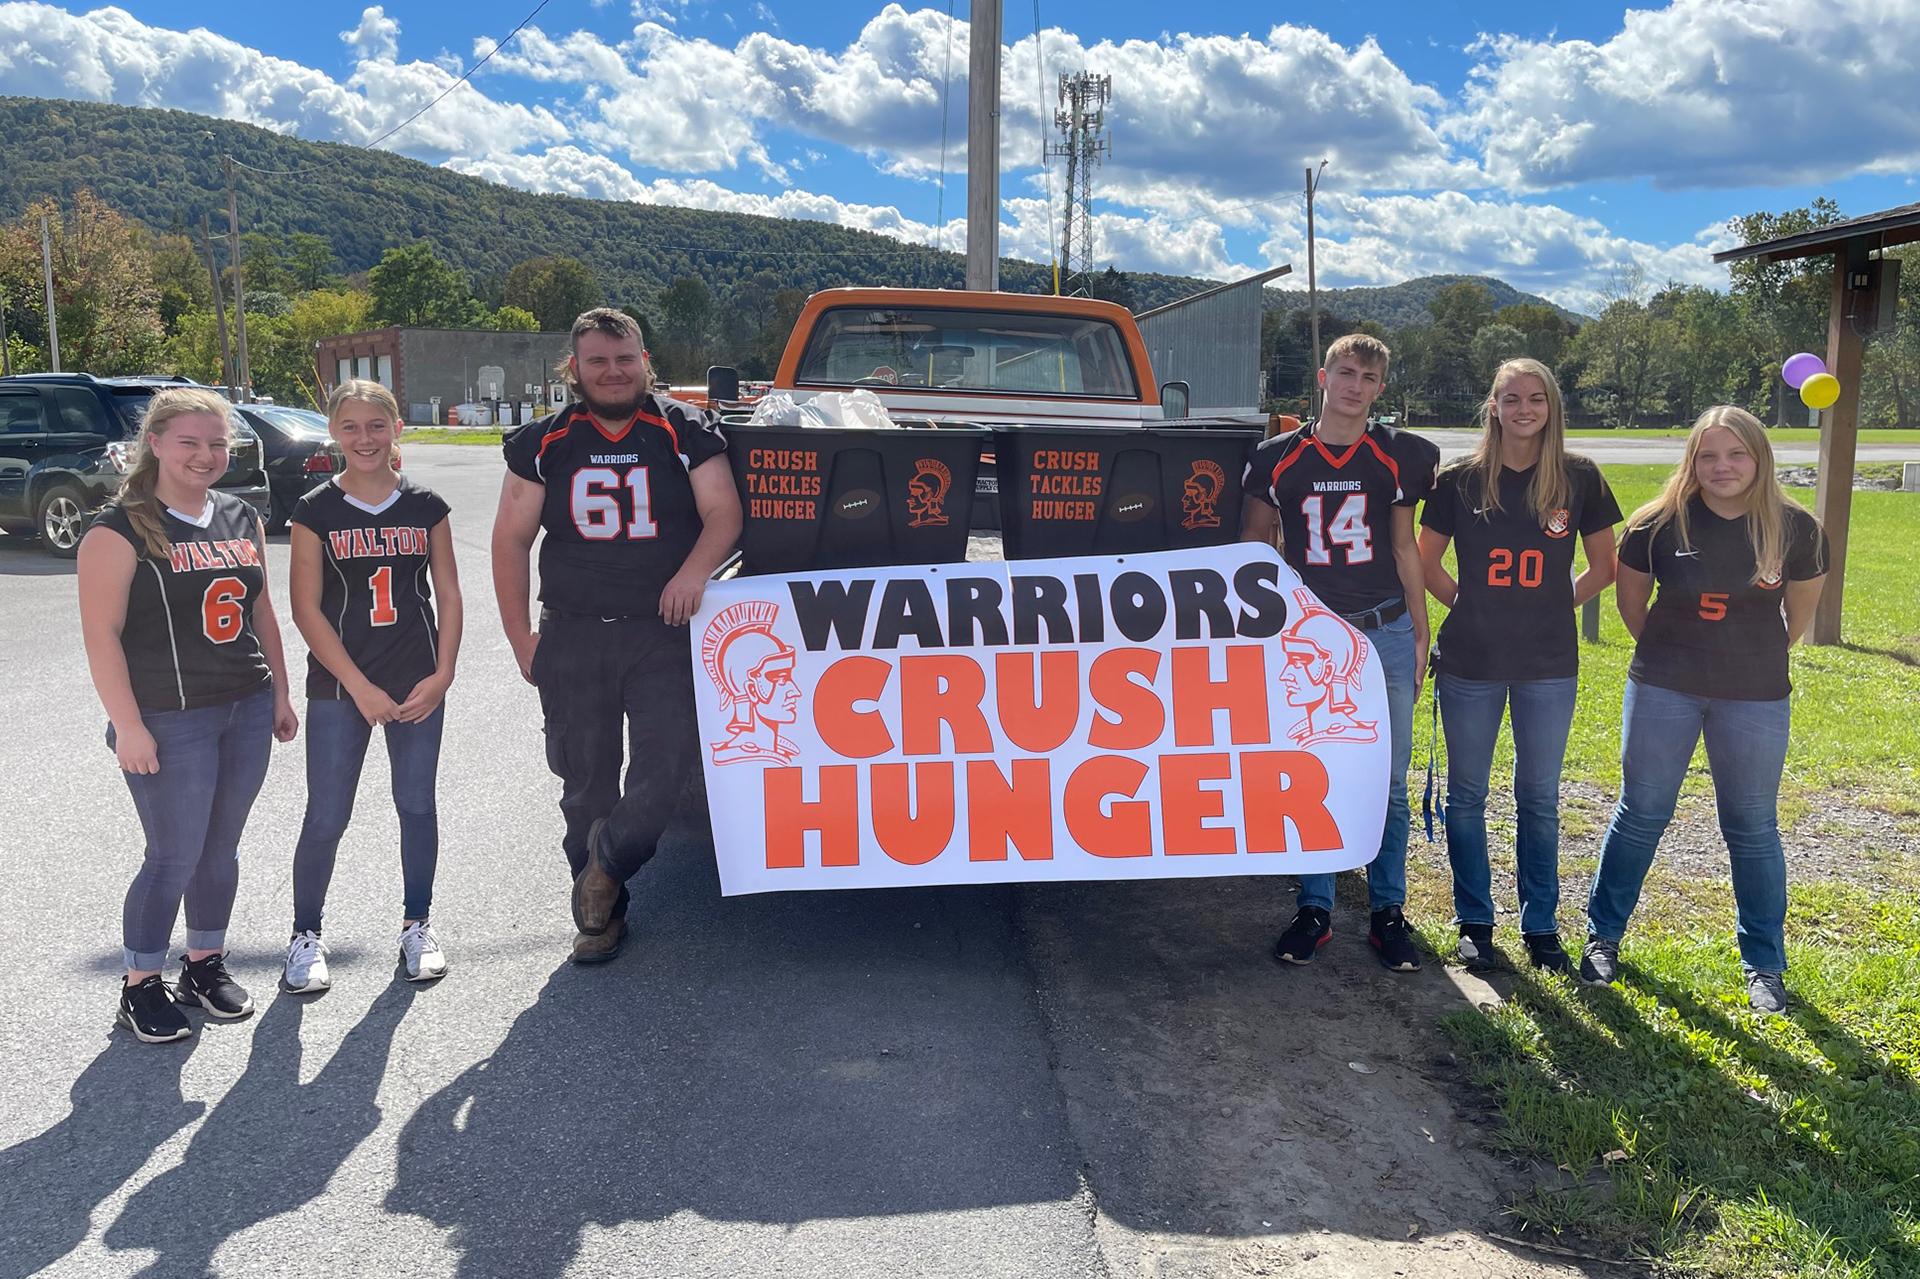 Warriors Crush Hunger group